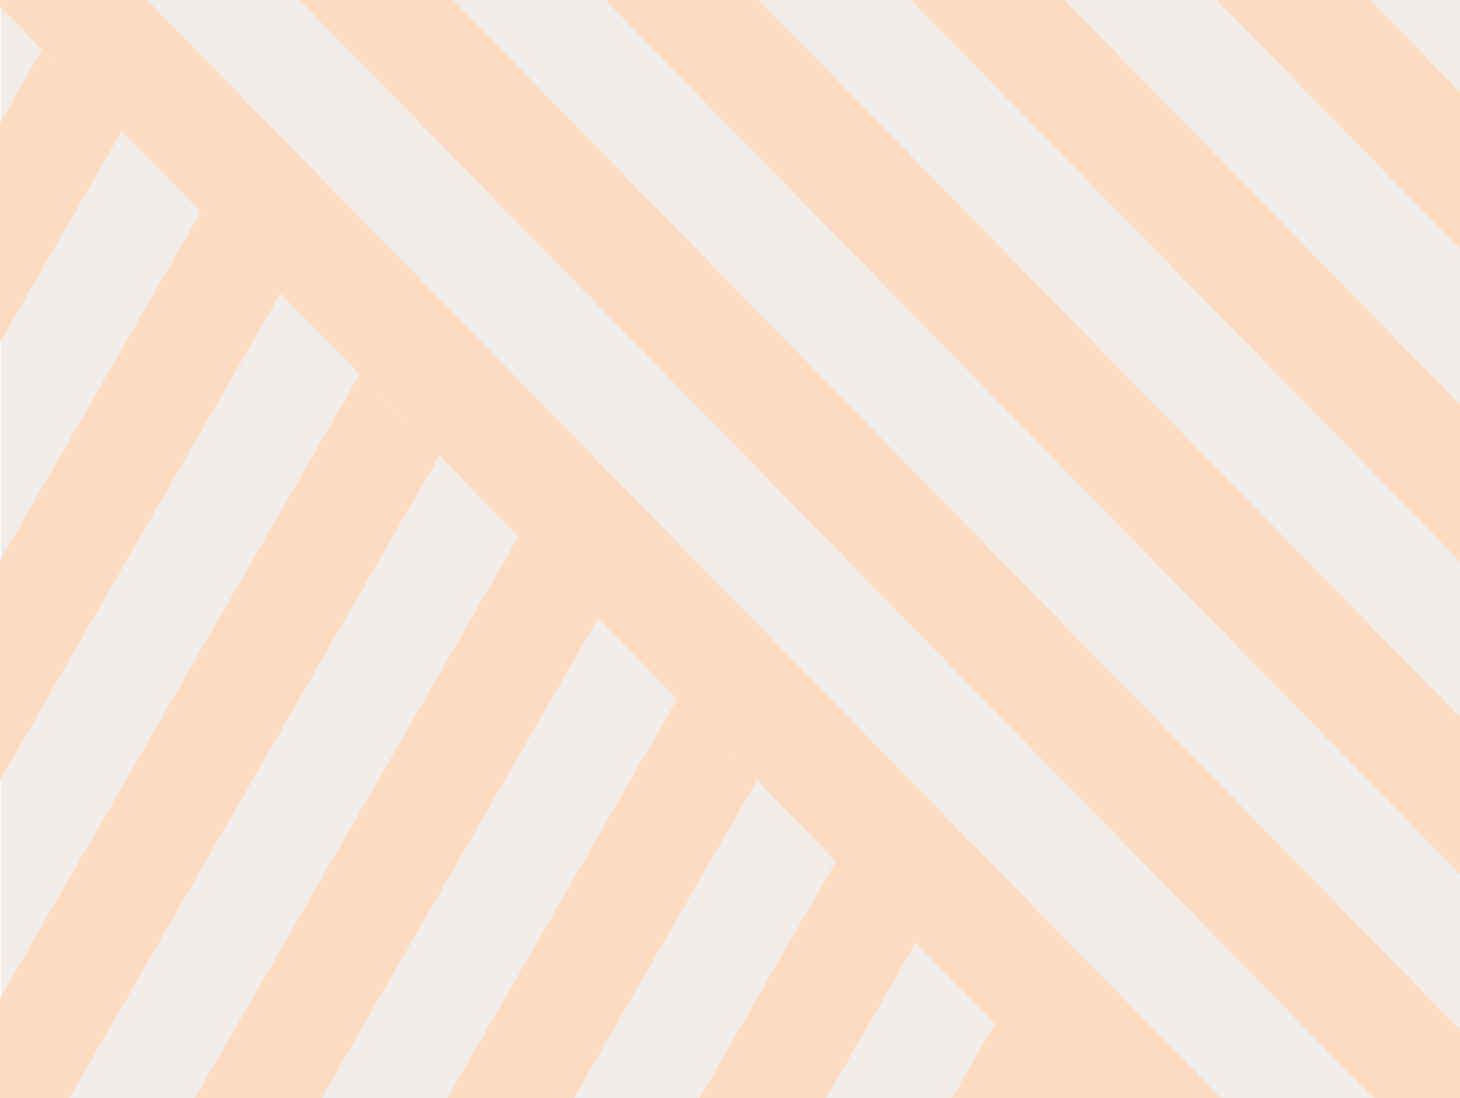 LizGastro_Pattern_02.jpg